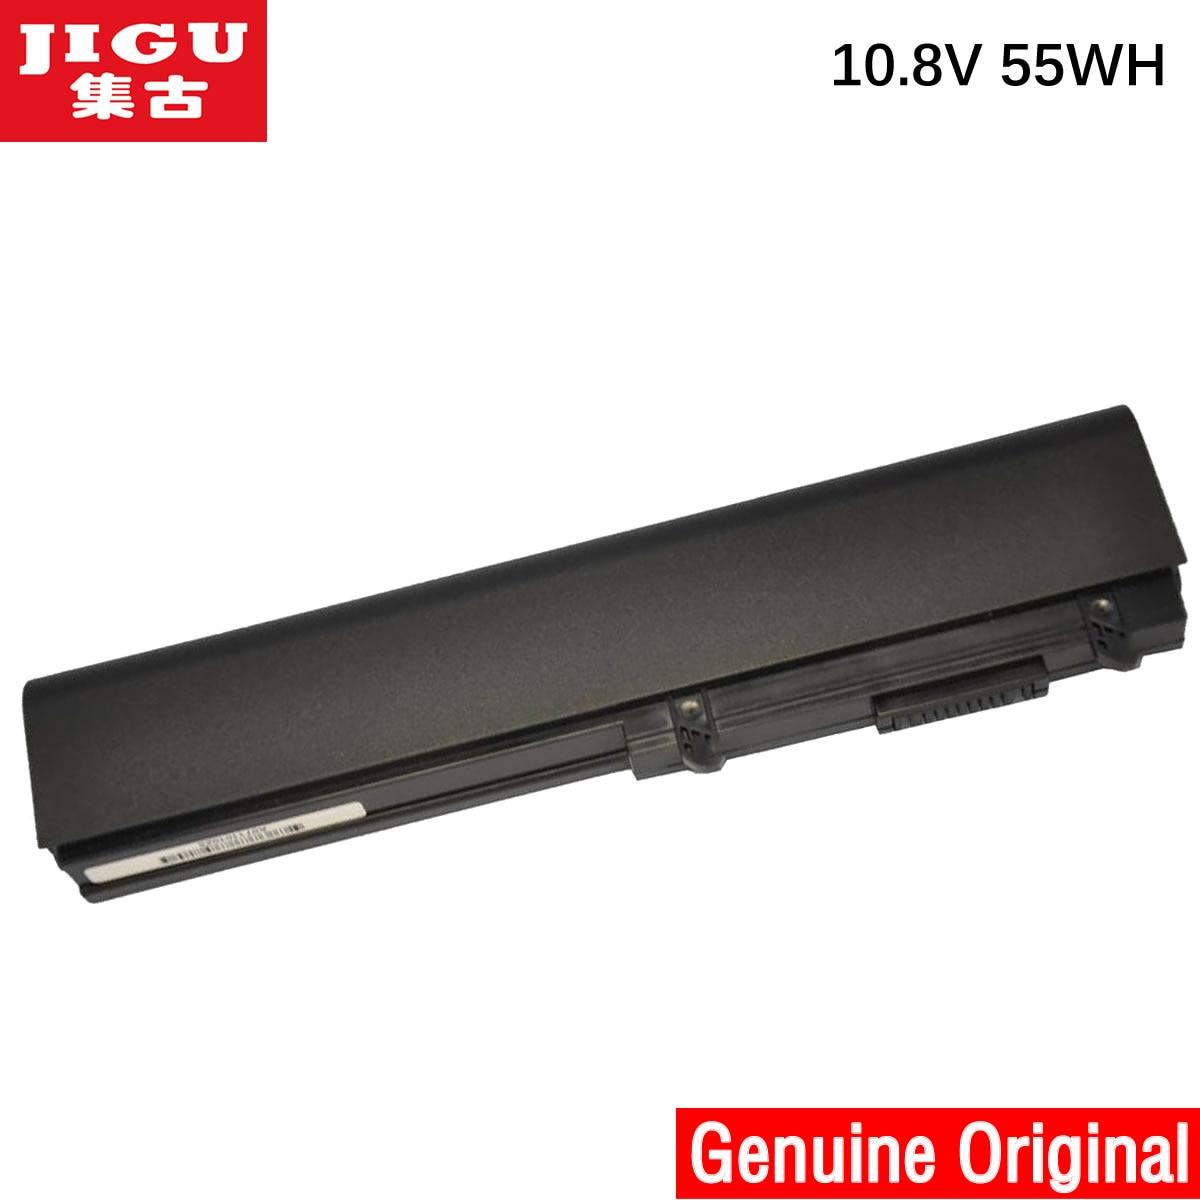 JIGU Dorigine batterie dordinateur portable Pour HP Pavilion Dv3000/CT Dv3001TX Dv3500ea Dv3500en Dv3500er Dv3500t Dv3505xx Dv3506la